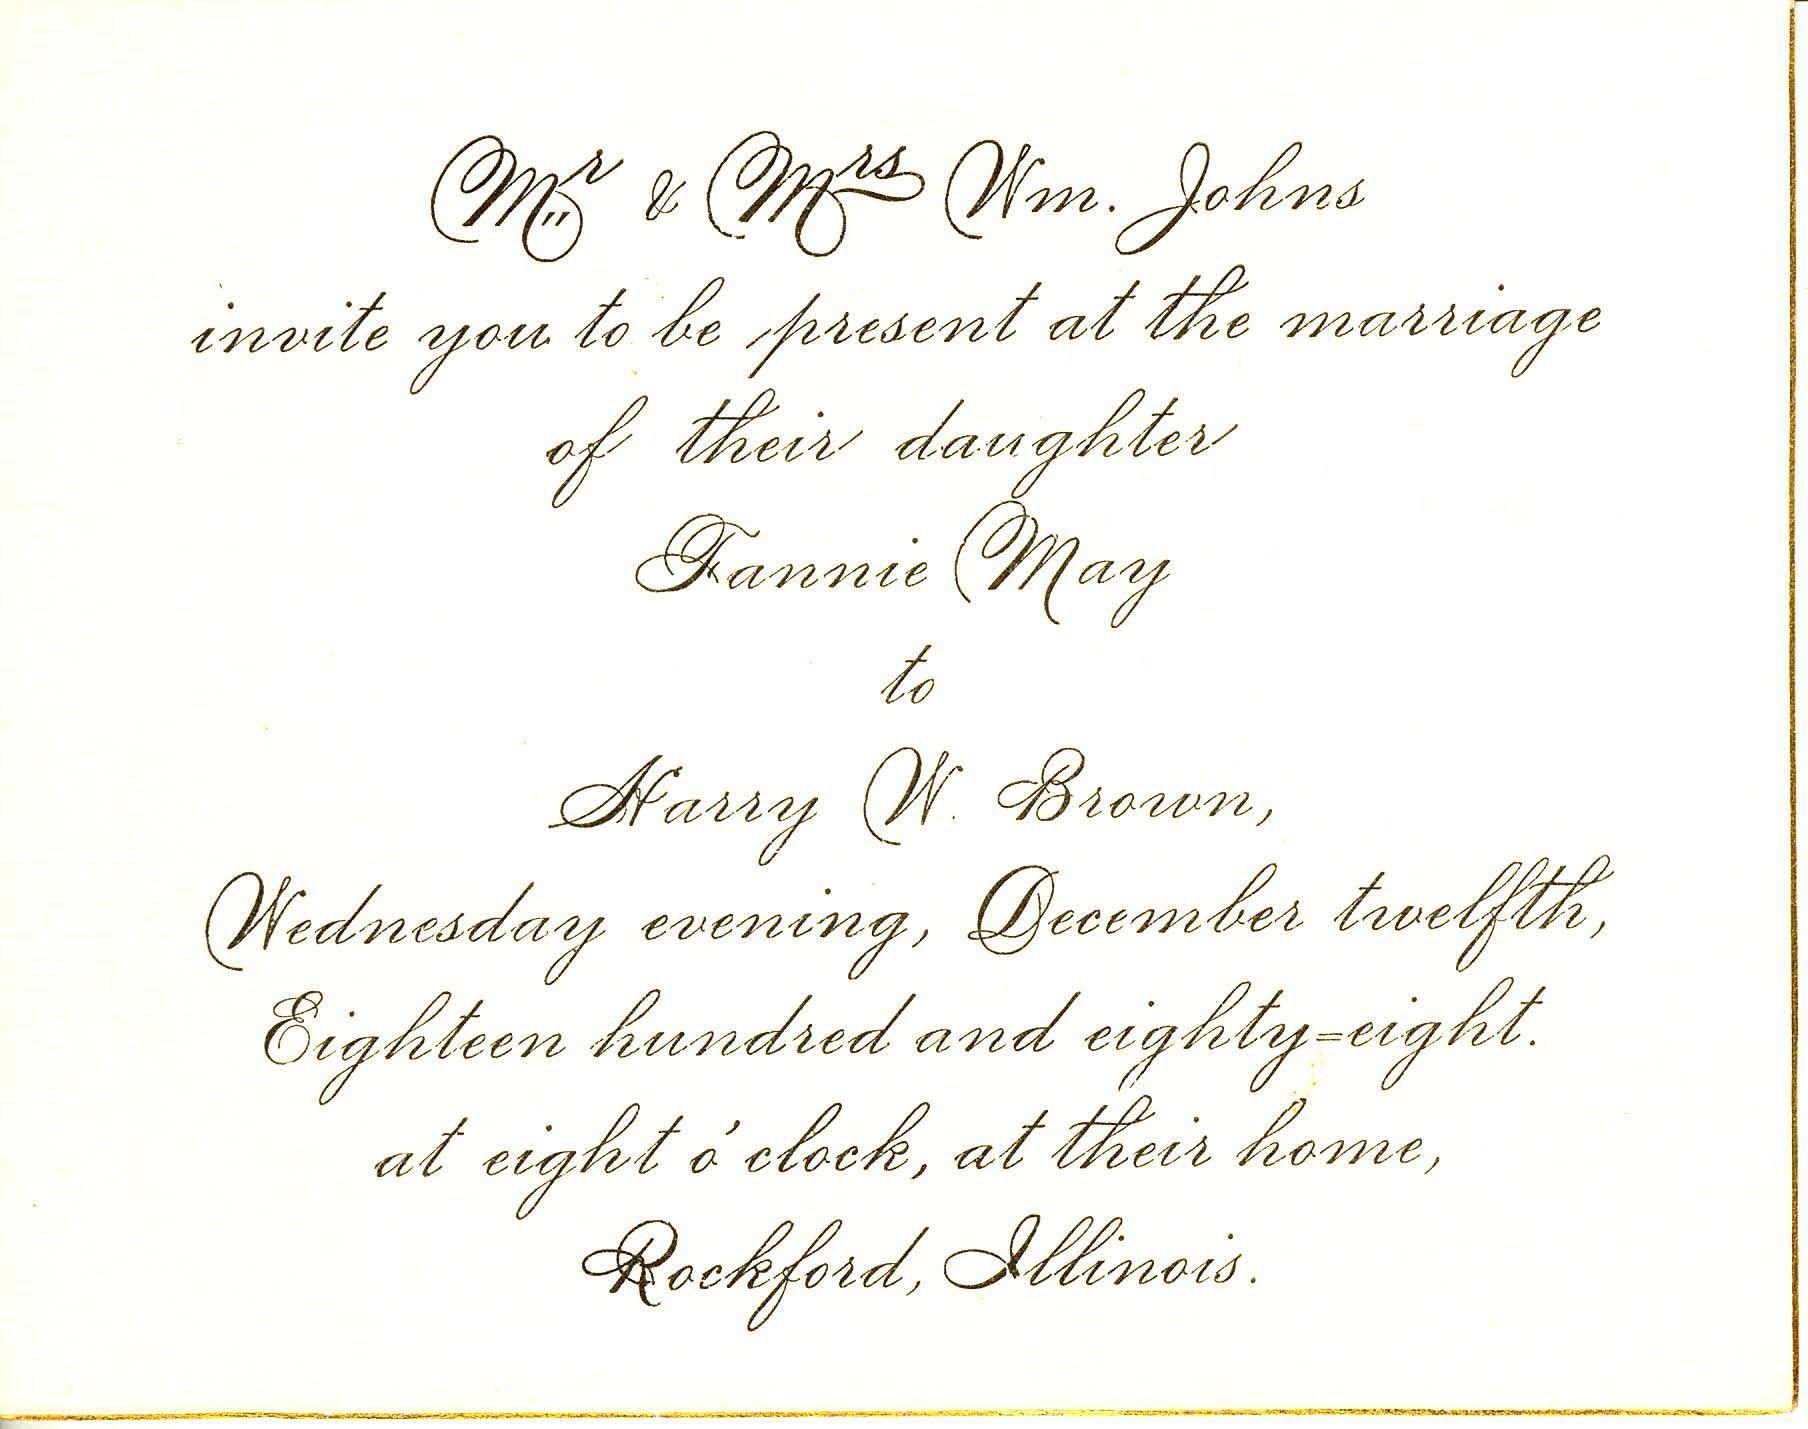 Doc sample birthday invitation letter wedding wording home doc sample birthday invitation letter wedding wording stopboris Choice Image